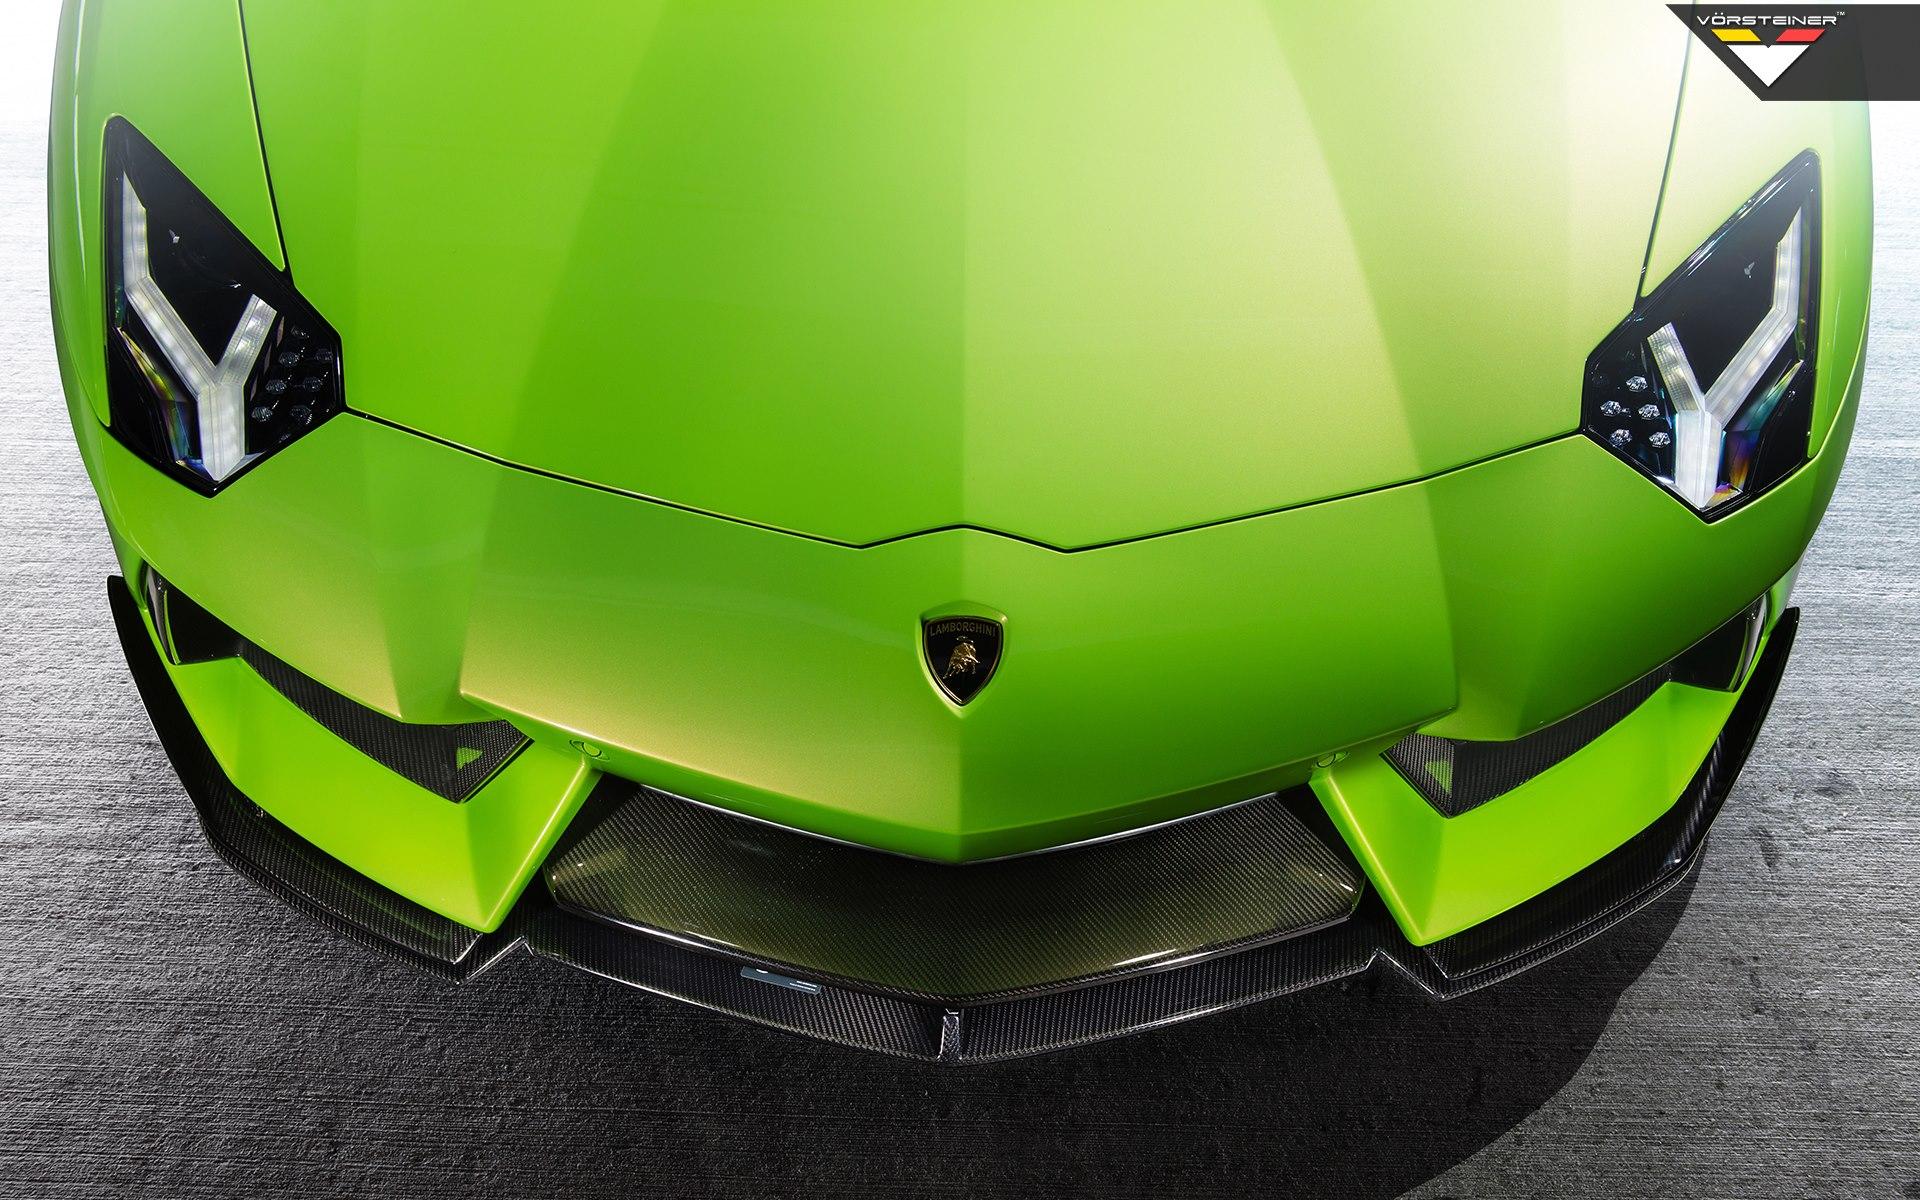 Honda Of Ithaca >> 2014 Vorsteiner Lamborghini Aventador V Verde Ithaca 3 Wallpaper | HD Car Wallpapers | ID #4498